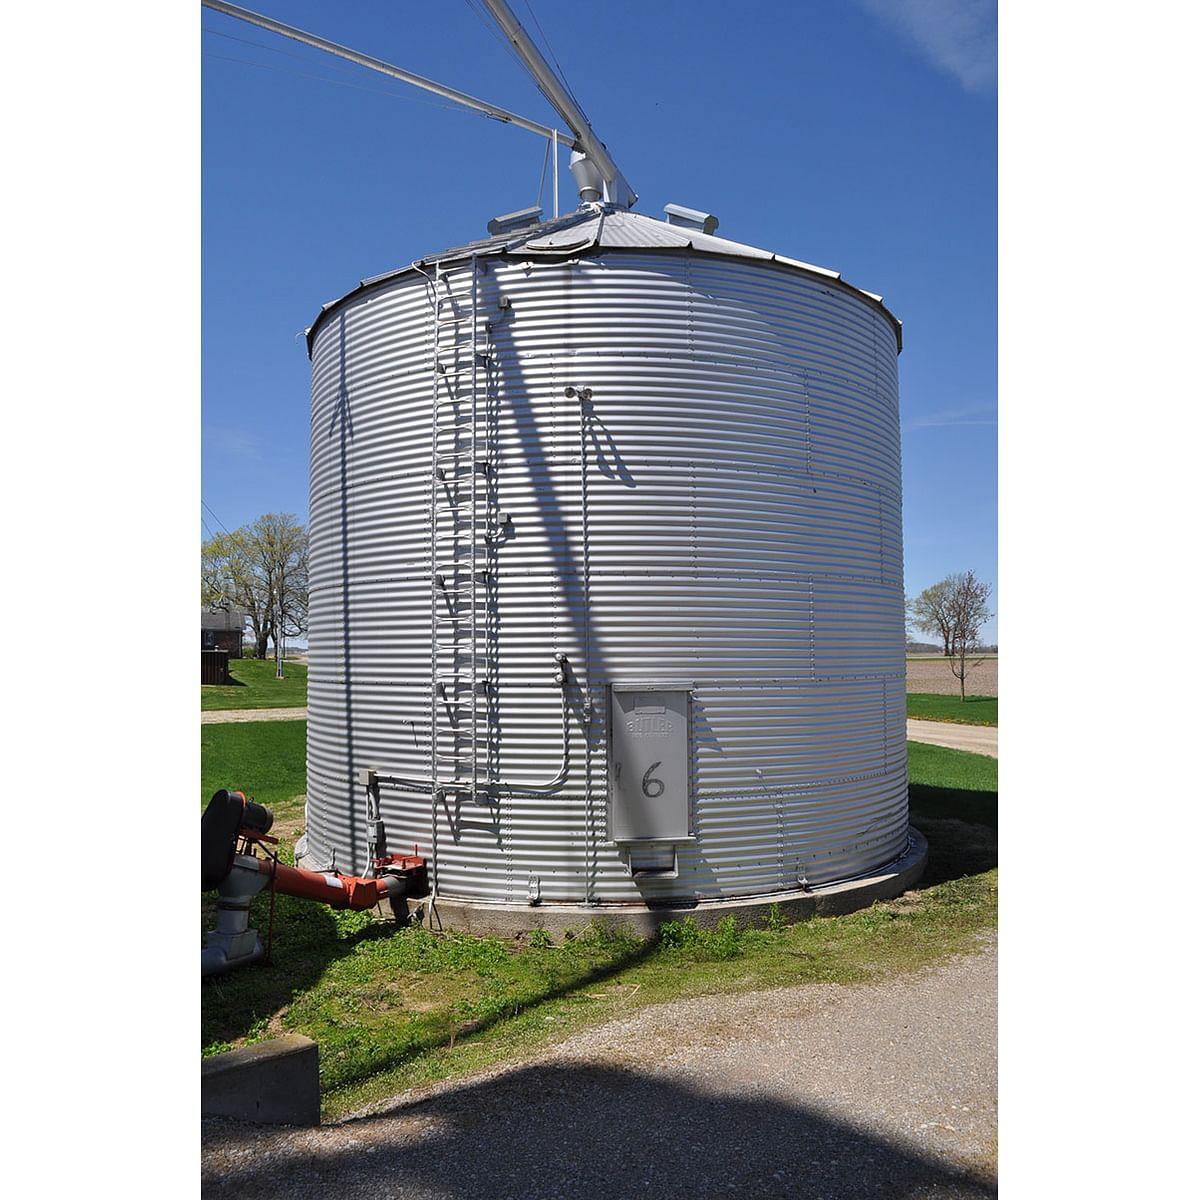 Online Only Auction - Davisson Grain Bin & Handling   The